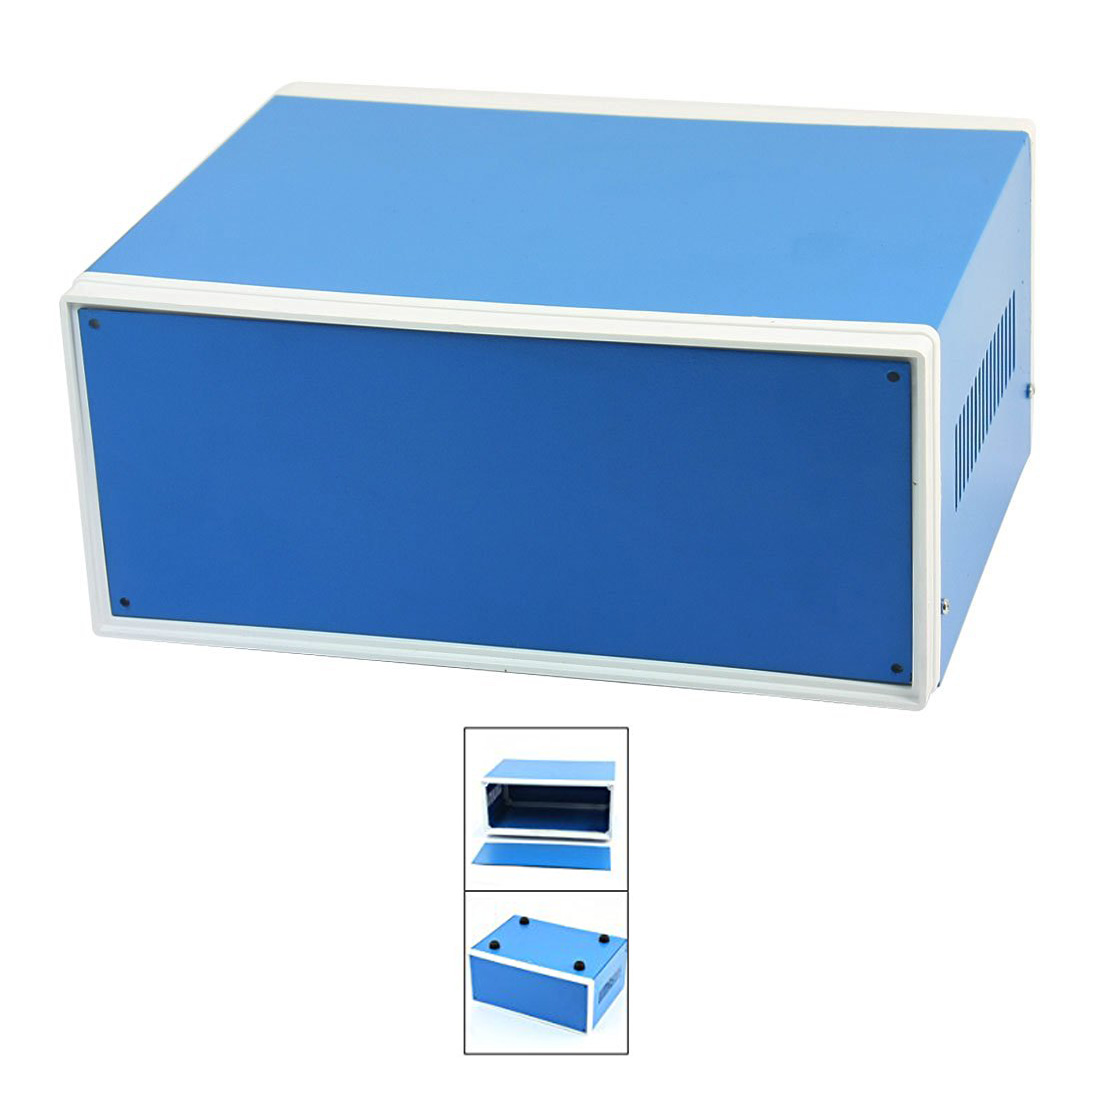 цена на HHTL-9.8 x 7.5 x 4.3 Blue Metal Enclosure Project Case DIY Junction Box